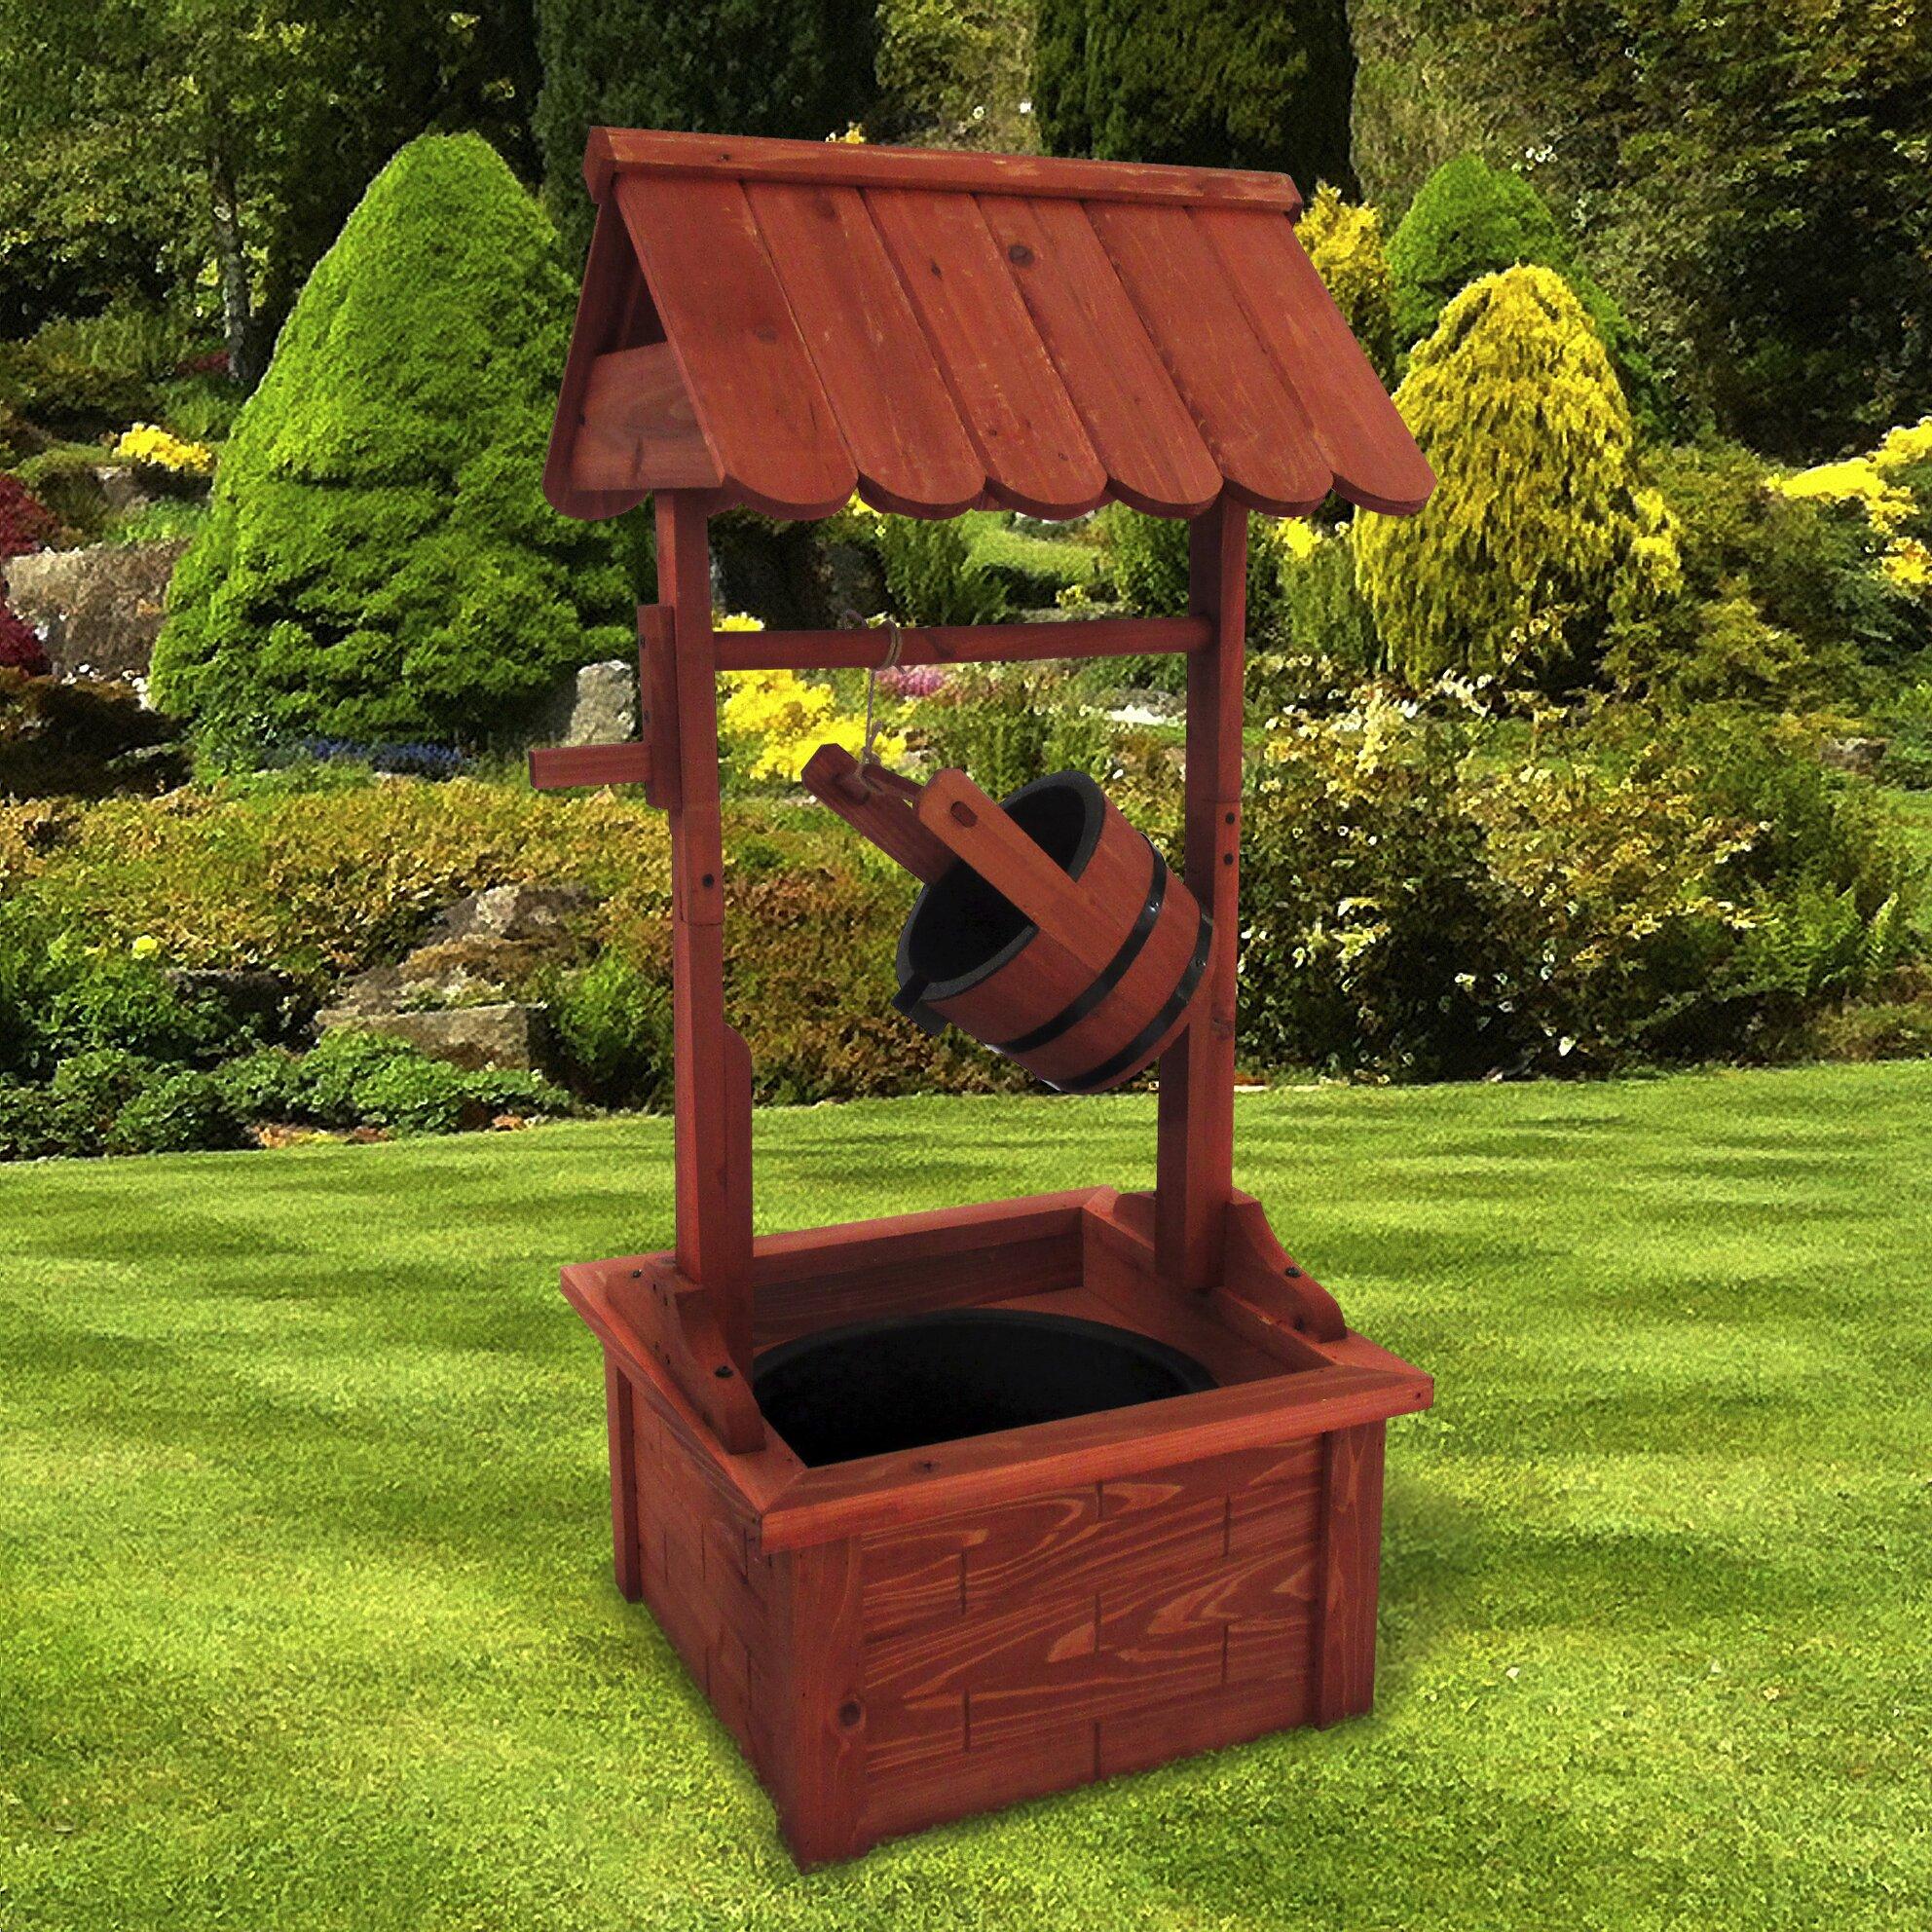 Wishing well lawn ornament - Wood Wishing Well Fountain